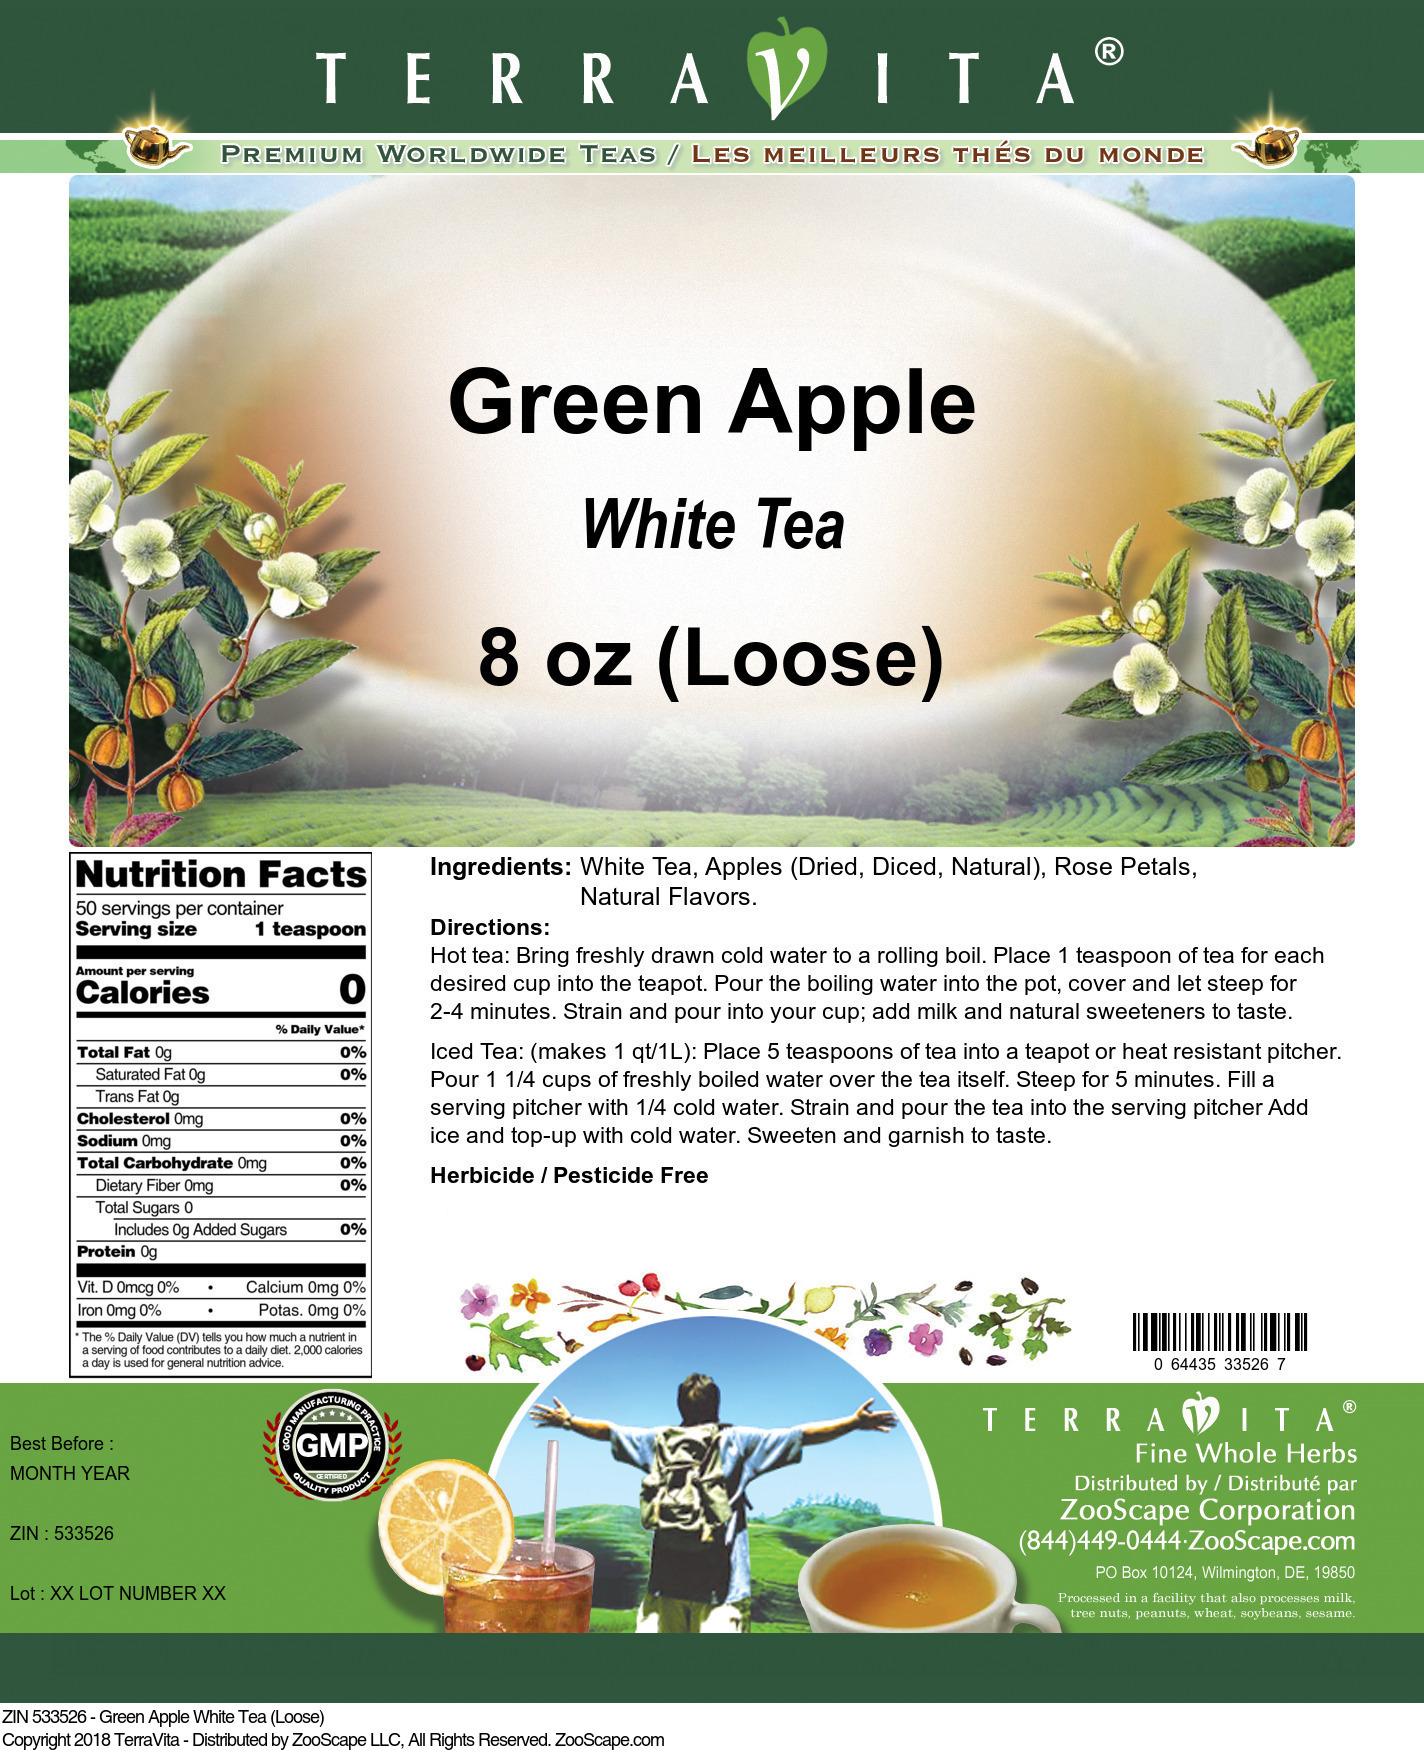 Green Apple White Tea